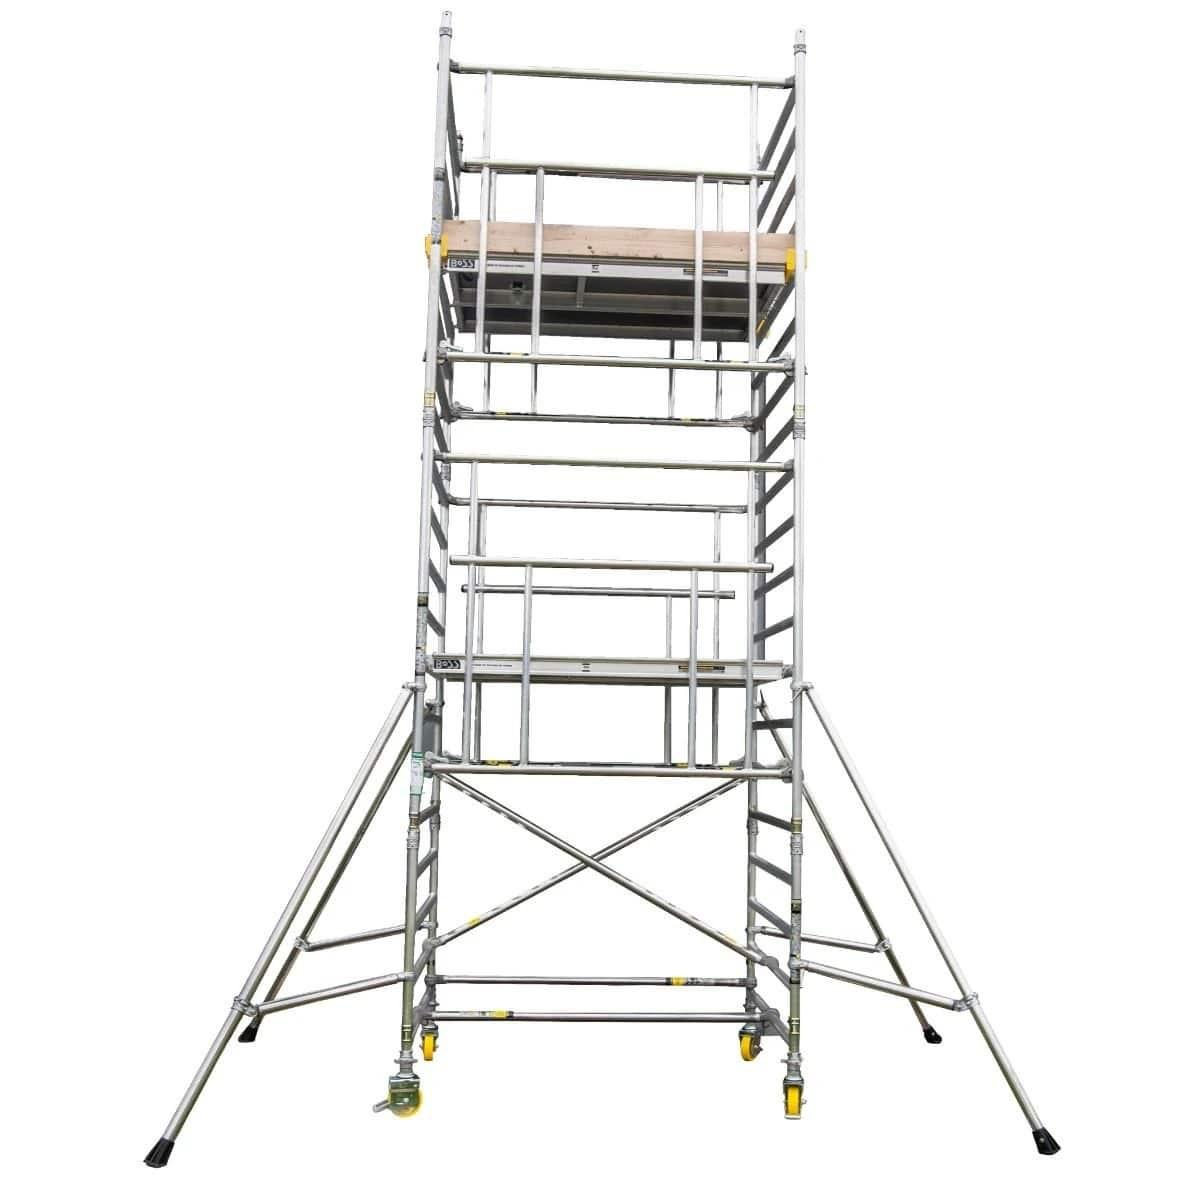 Boss Narrow 1.8m Camlock AGR Tower 9.3m Handrail Height 276Kg